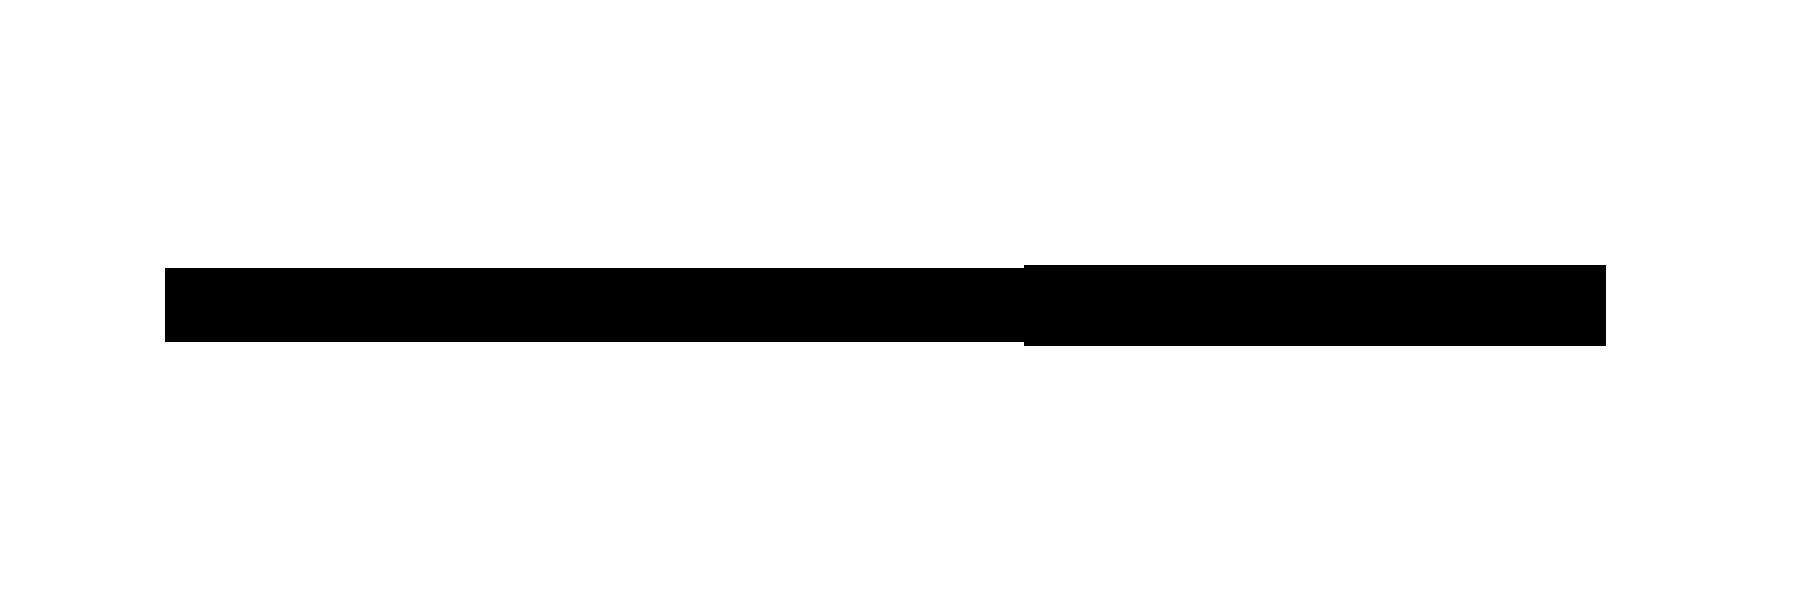 01_SunsetStudios_Logos_05B